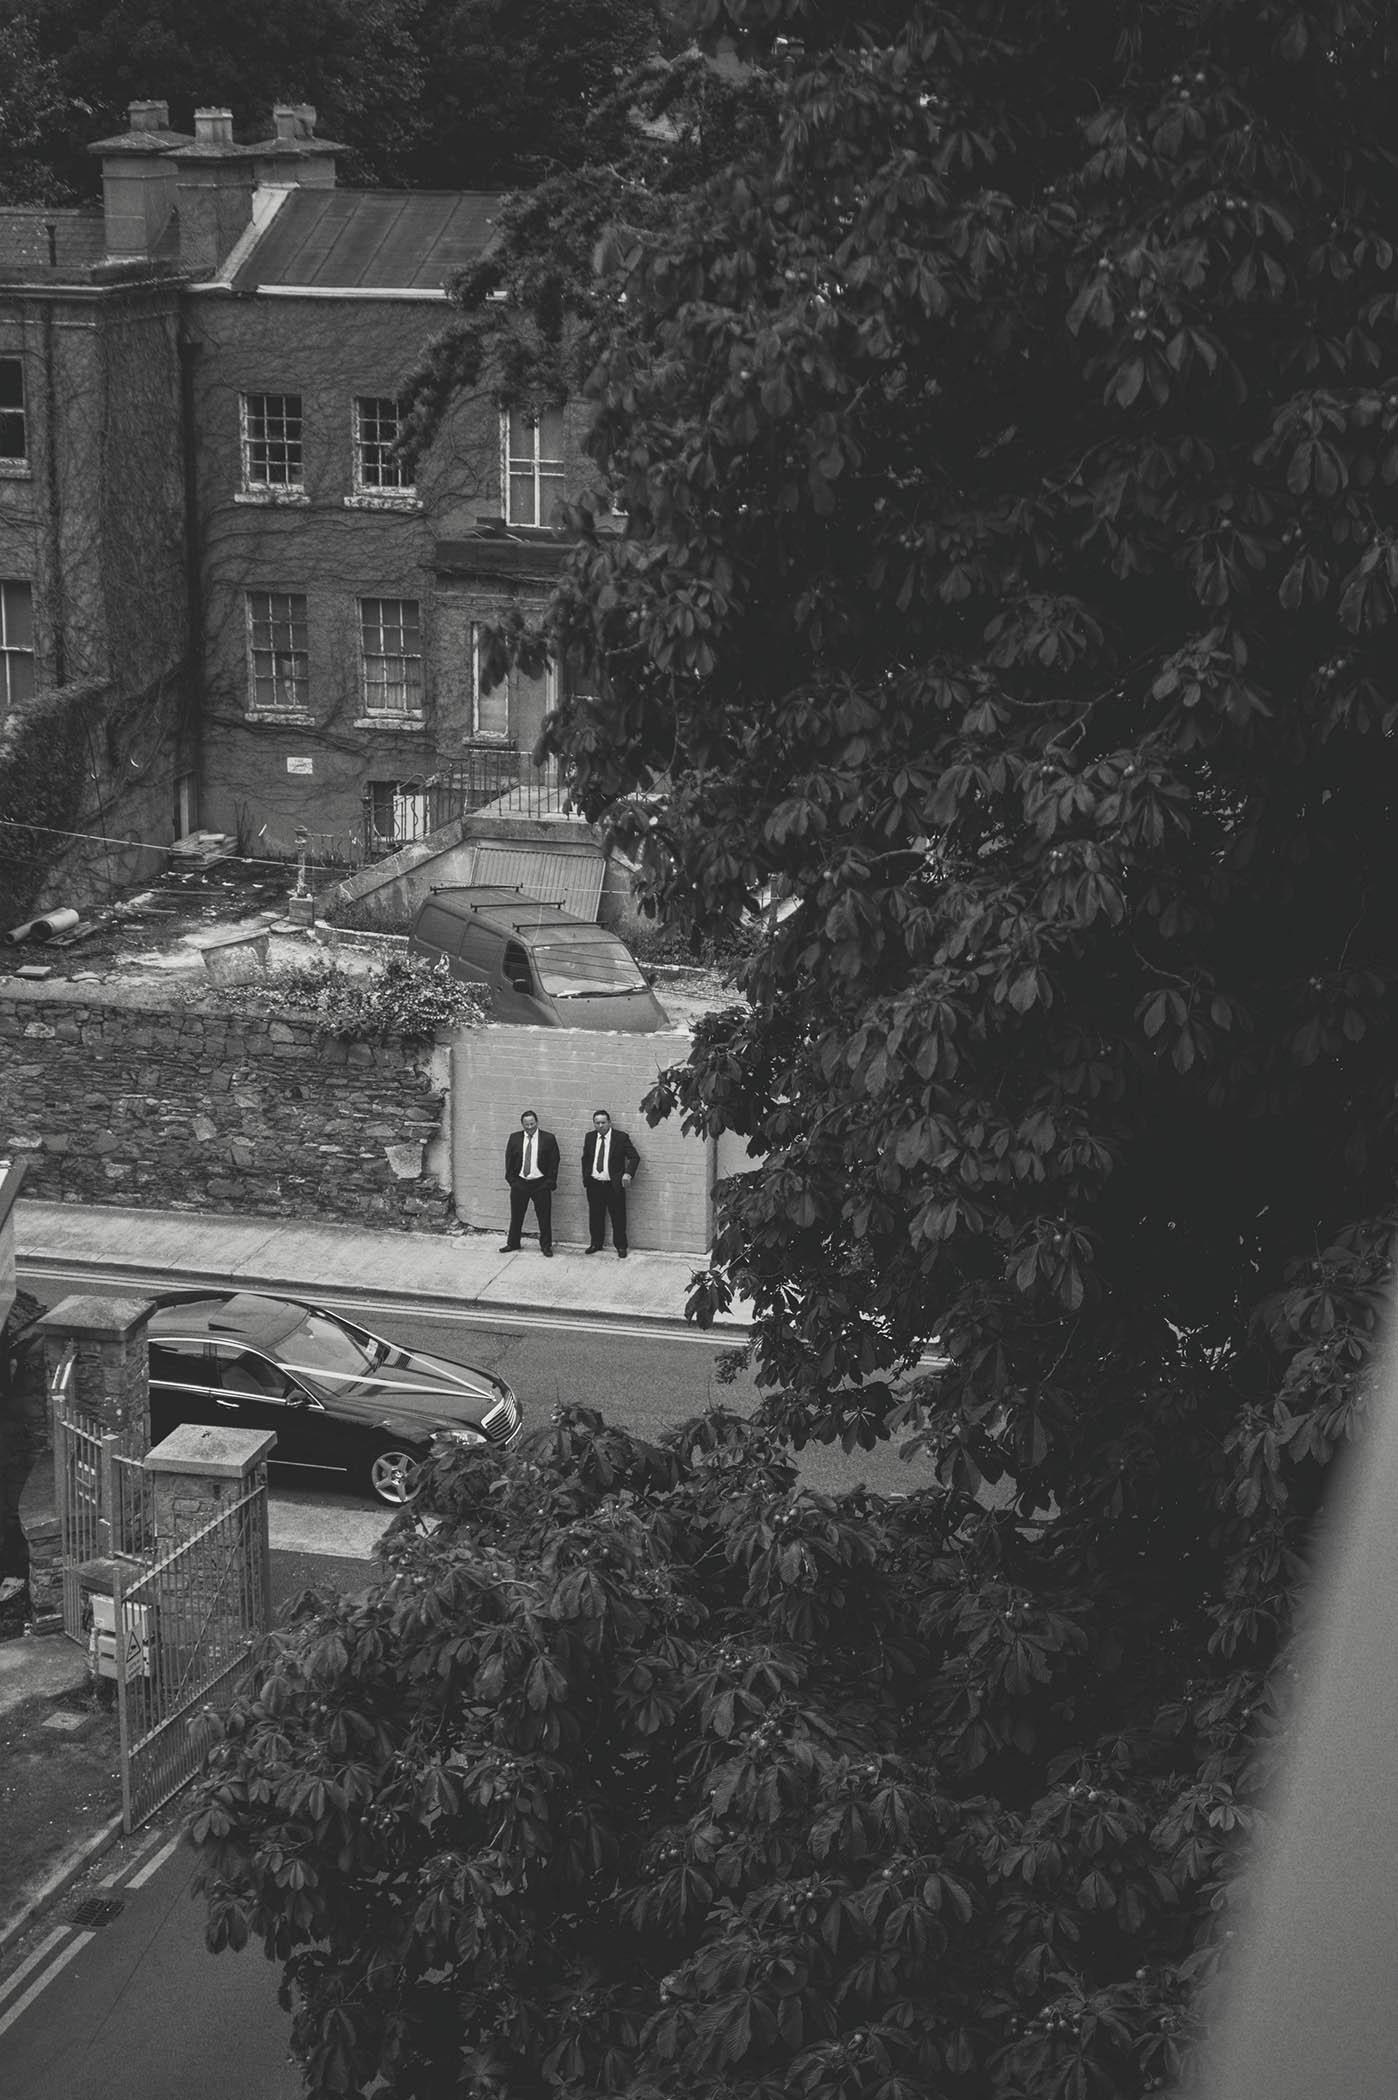 Fallon & Byrne Wedding 2014, Far away shot of groom